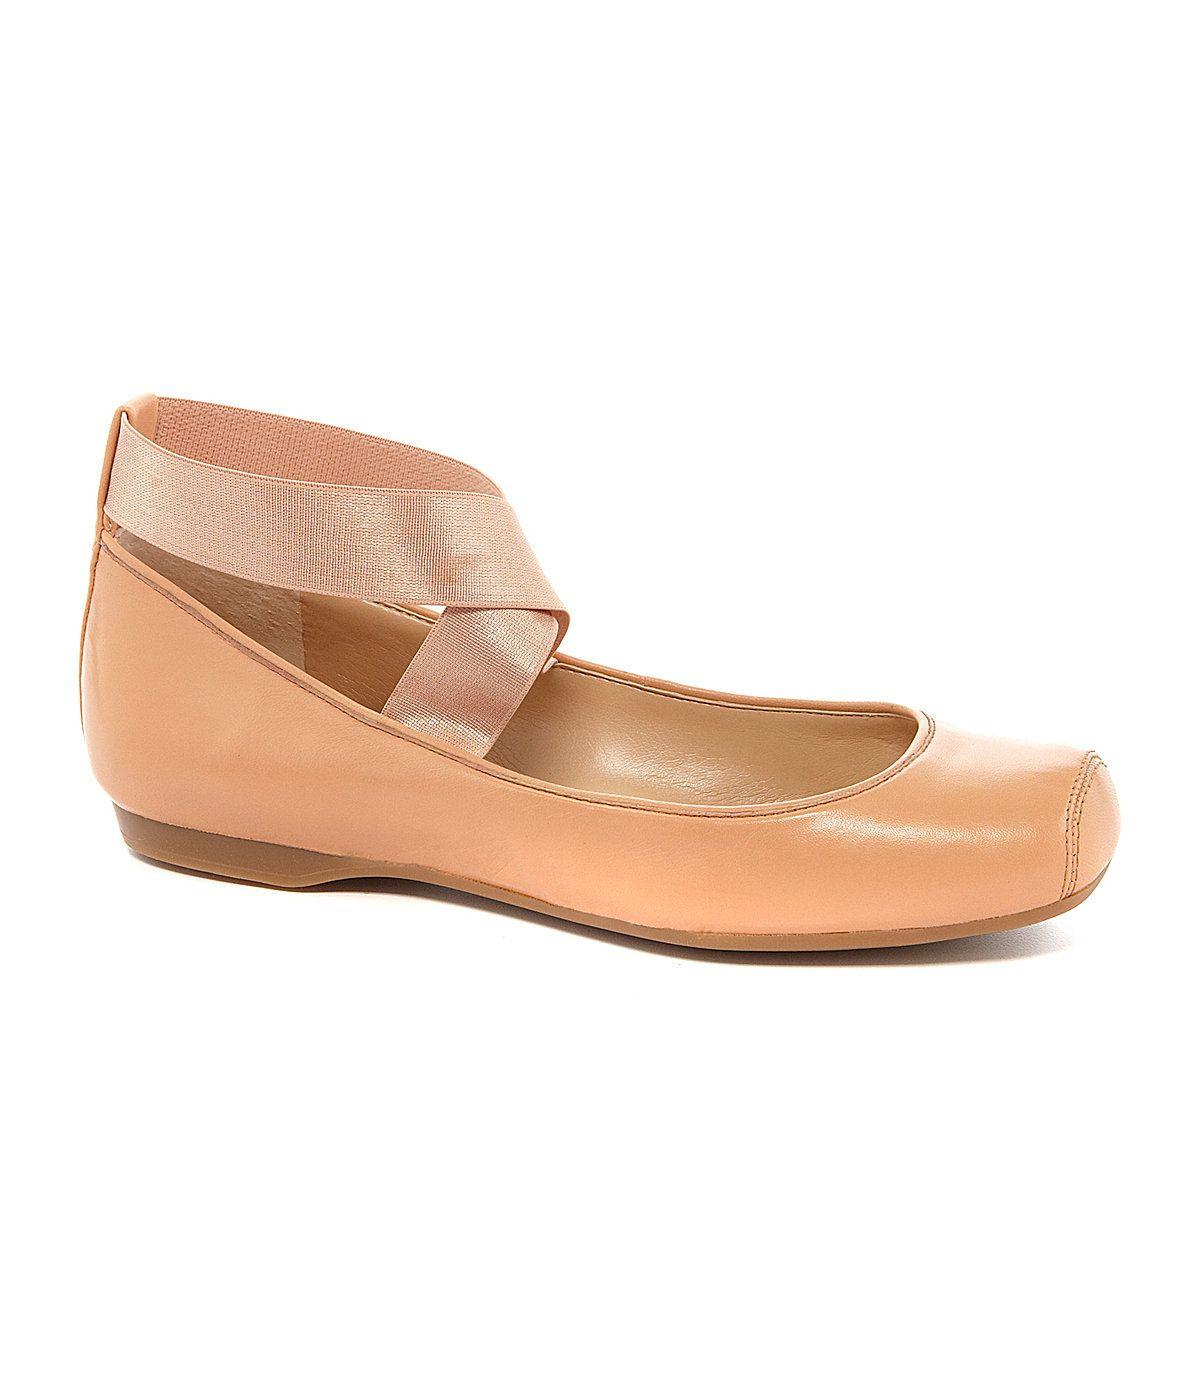 Mandalaye Leather Square-Toe Criss Cross Ankle Straps Ballet Flats xW1EPPYPtO